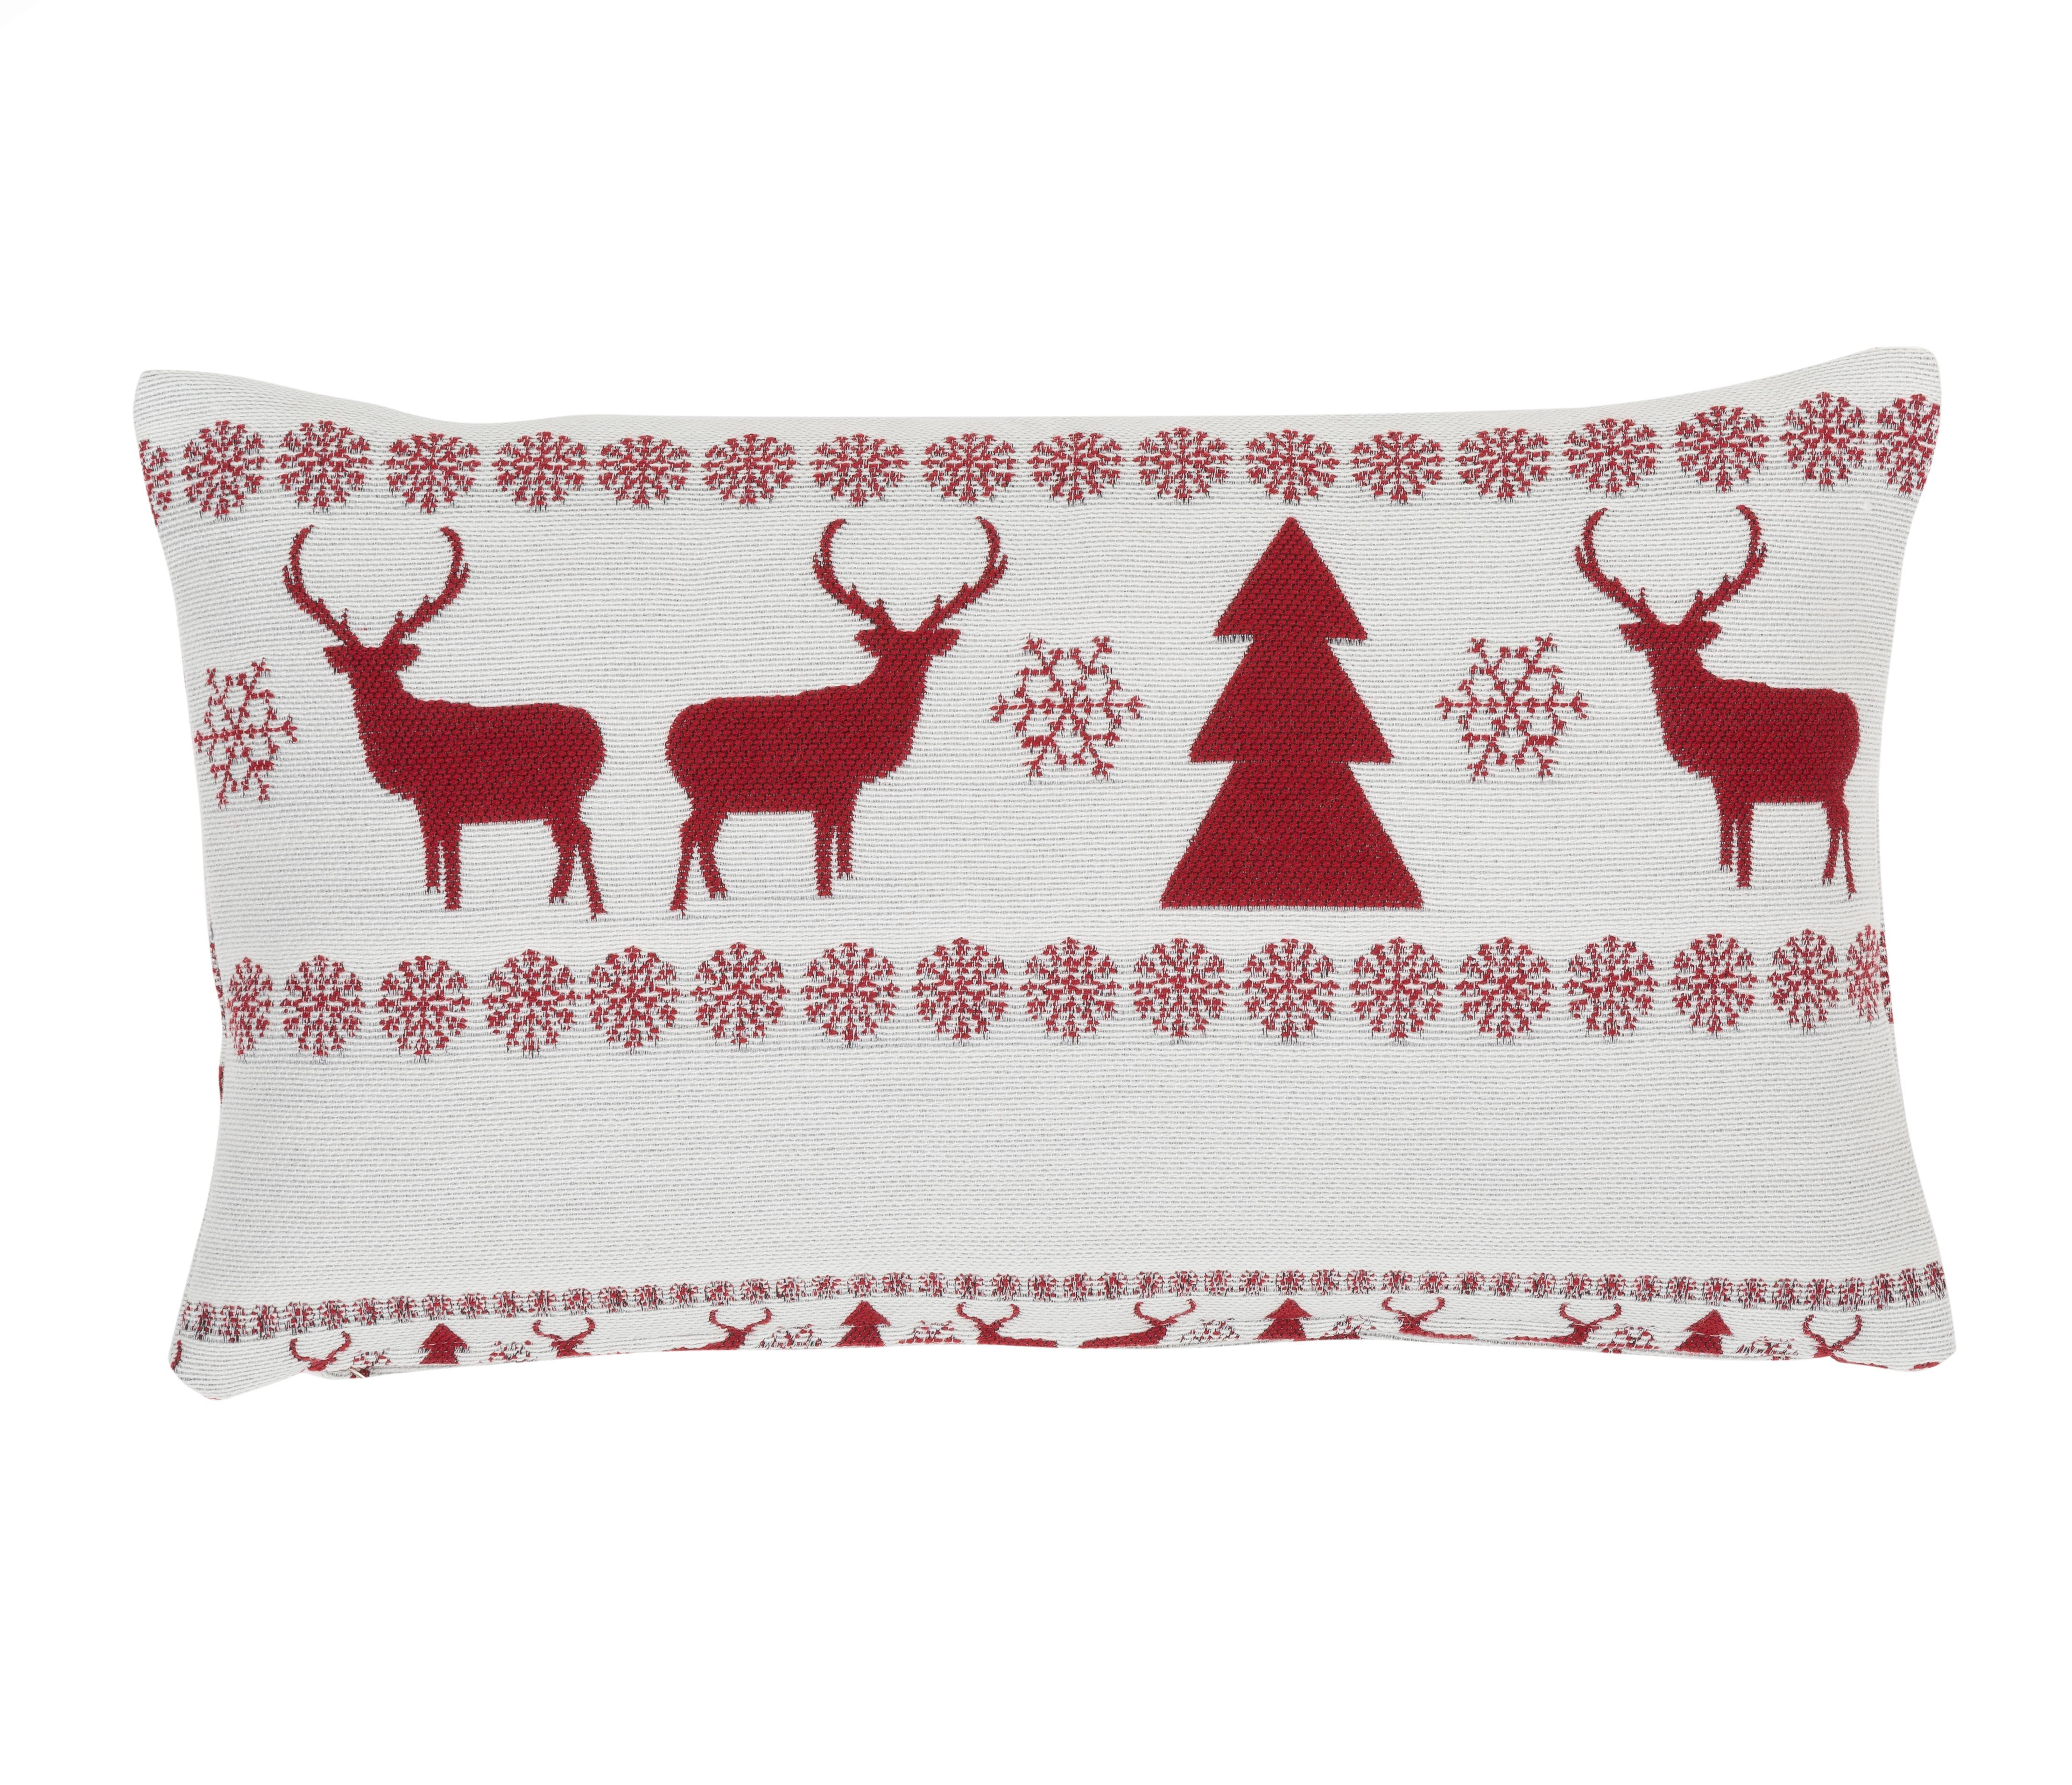 Kissenhülle Nordic Winter mit weihnachtlichem Muster, 56% Polyester, 31% Acryl, 13% Wolle, Cremeweiß, Rot, 30 x 50 cm